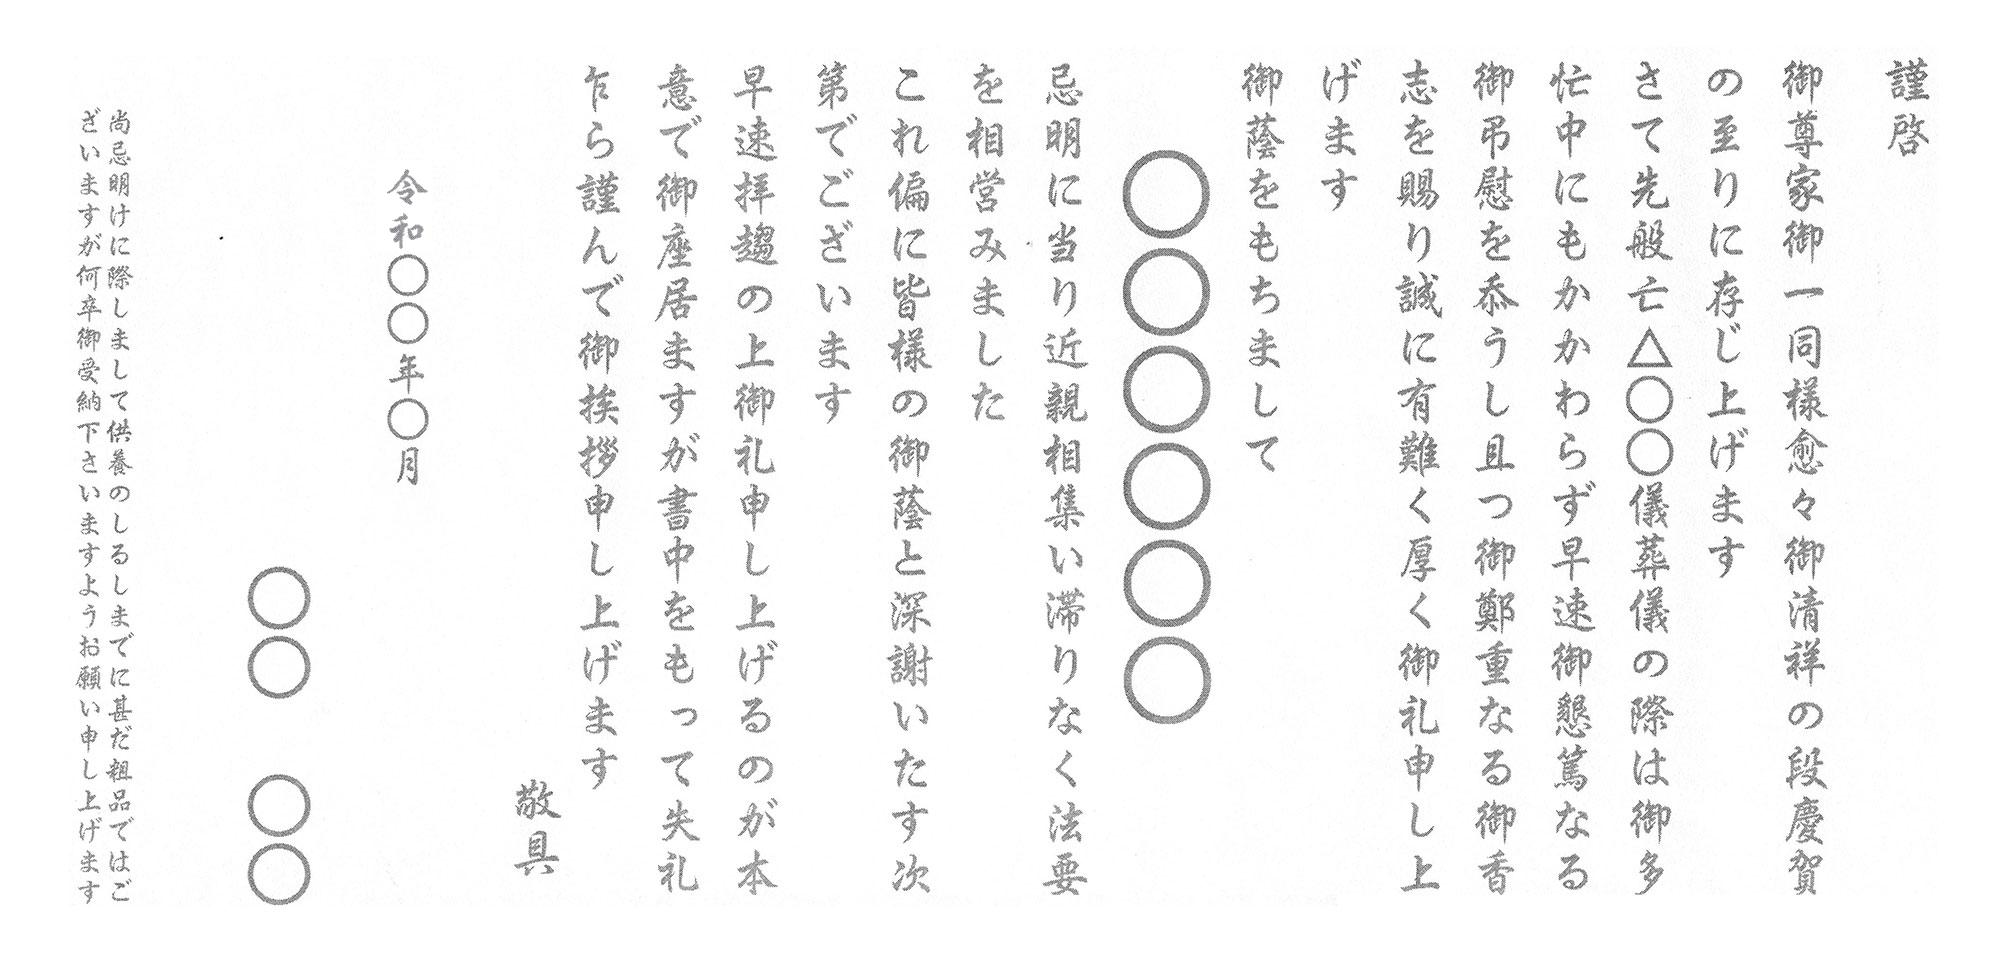 香典返し奉書挨拶状 仏教(PC作成)